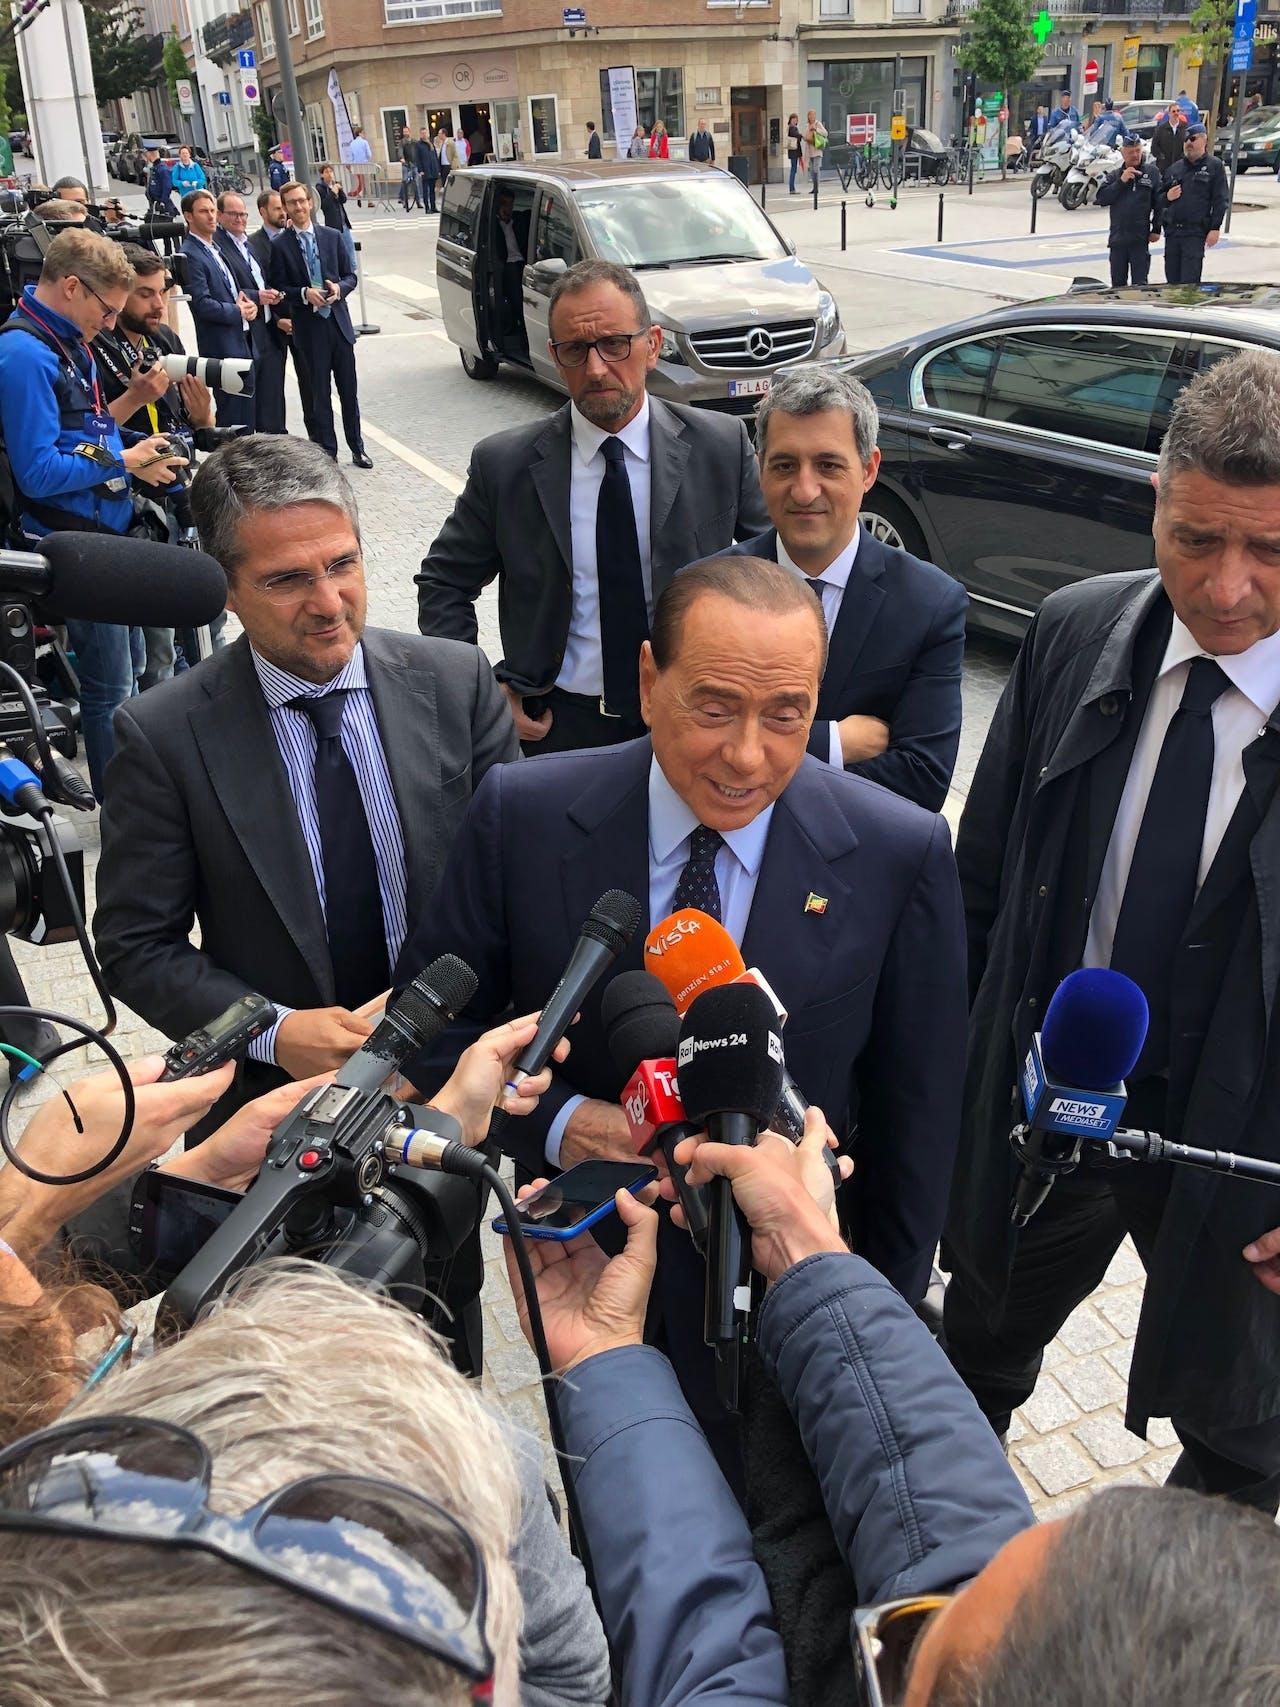 Silvio Berlusconi in Brussel. Afgelopen week voerde de oud-premier campagne samen met Lega-leider Matteo Salvini.